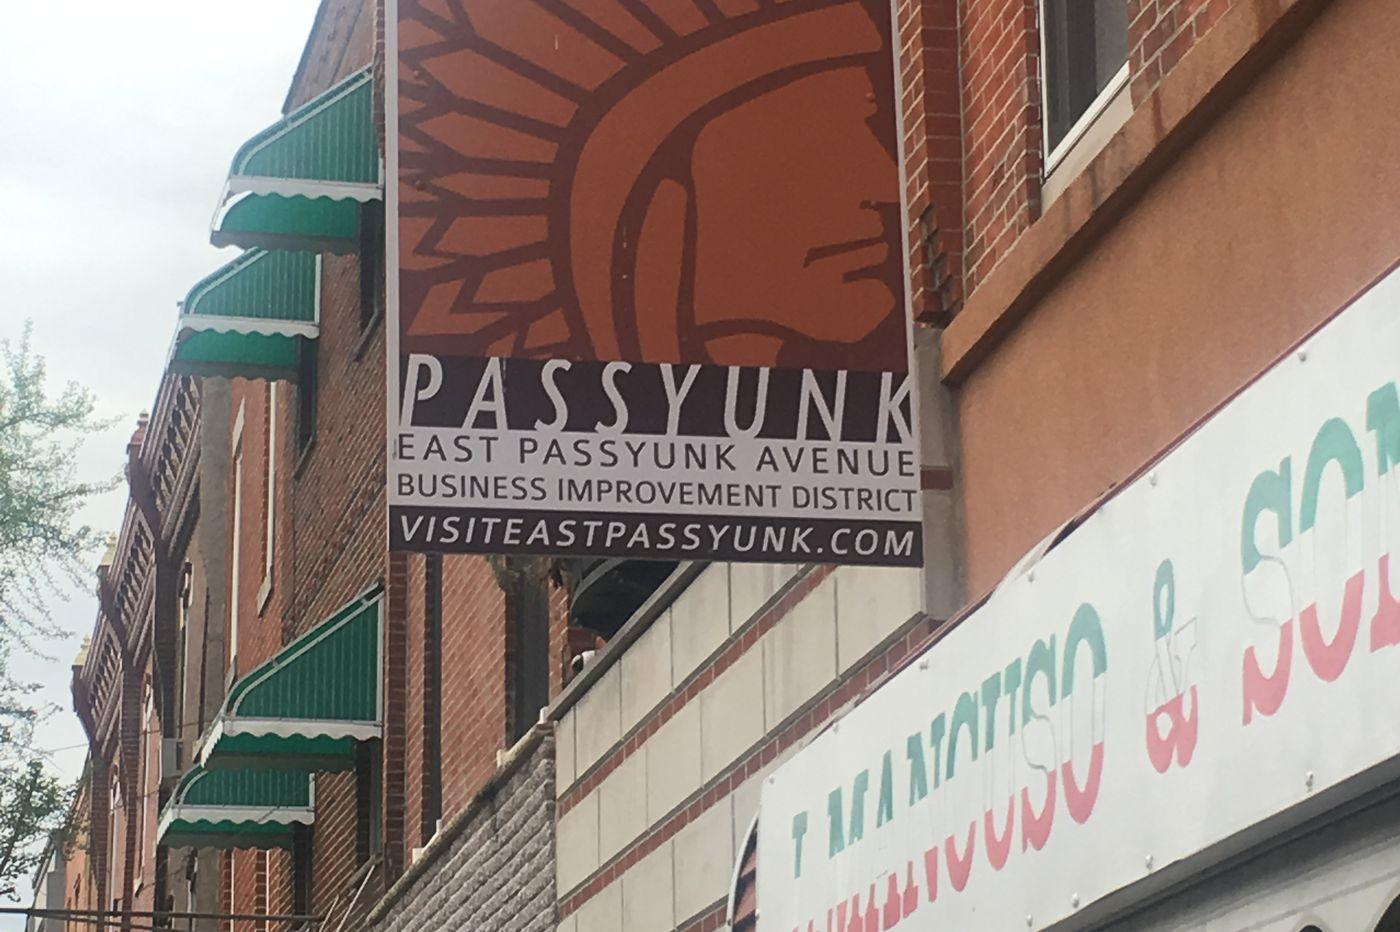 How the East Passyunk logo misrepresents Philadelphia's past   Opinion